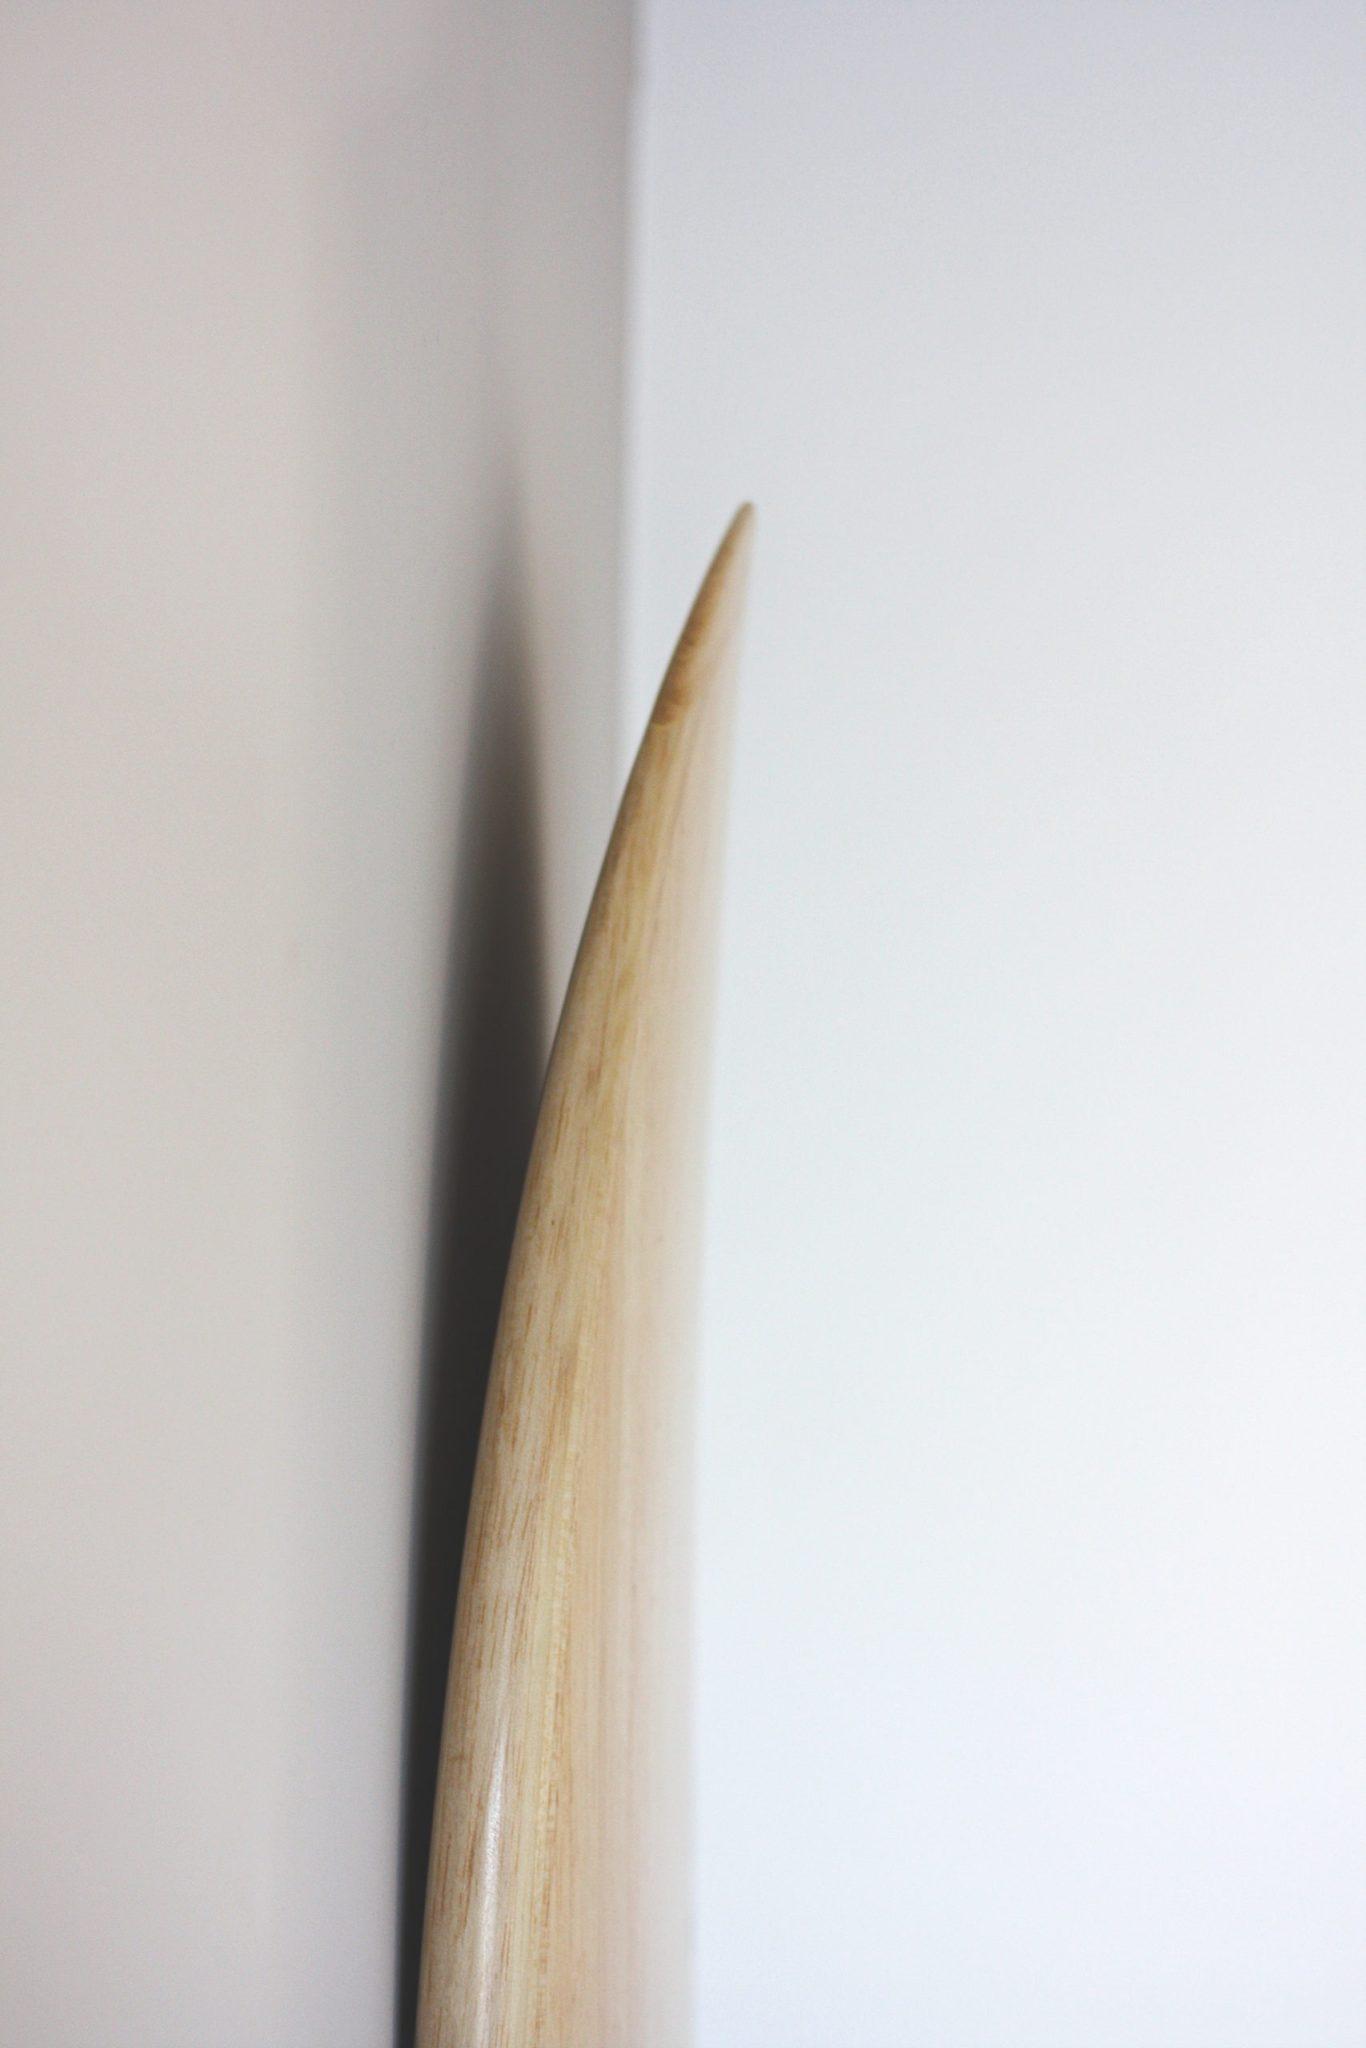 Cachalot Surfboards planche surf handmade artisan shaper hollow bois merguez